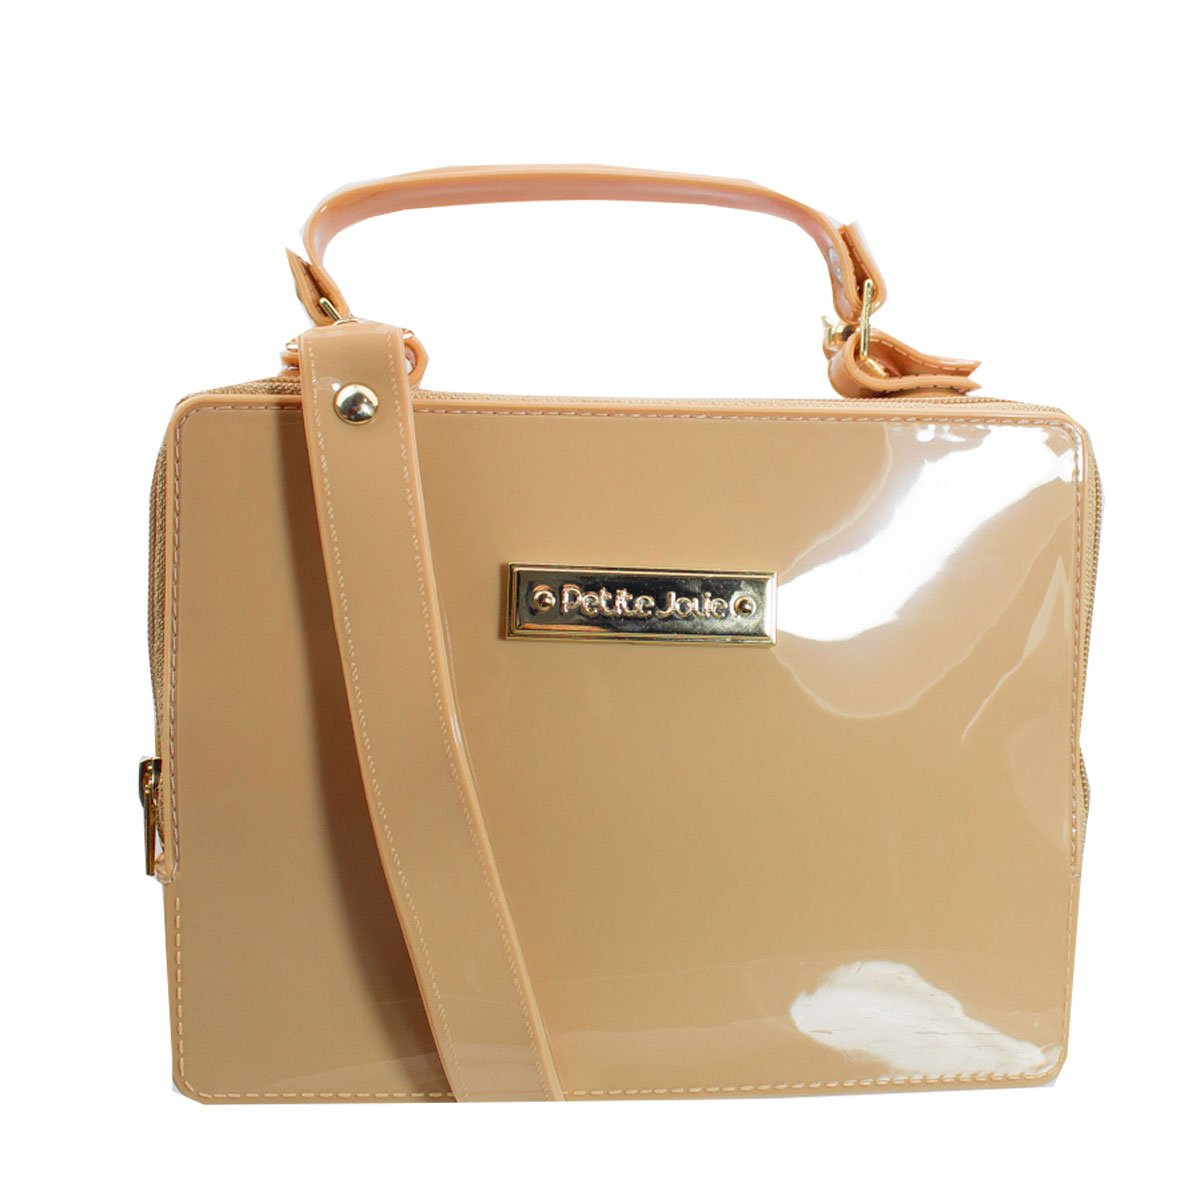 f20c72527 Bizz Store - Bolsa Feminina Petite Jolie Box Bag PVC Tiracolo